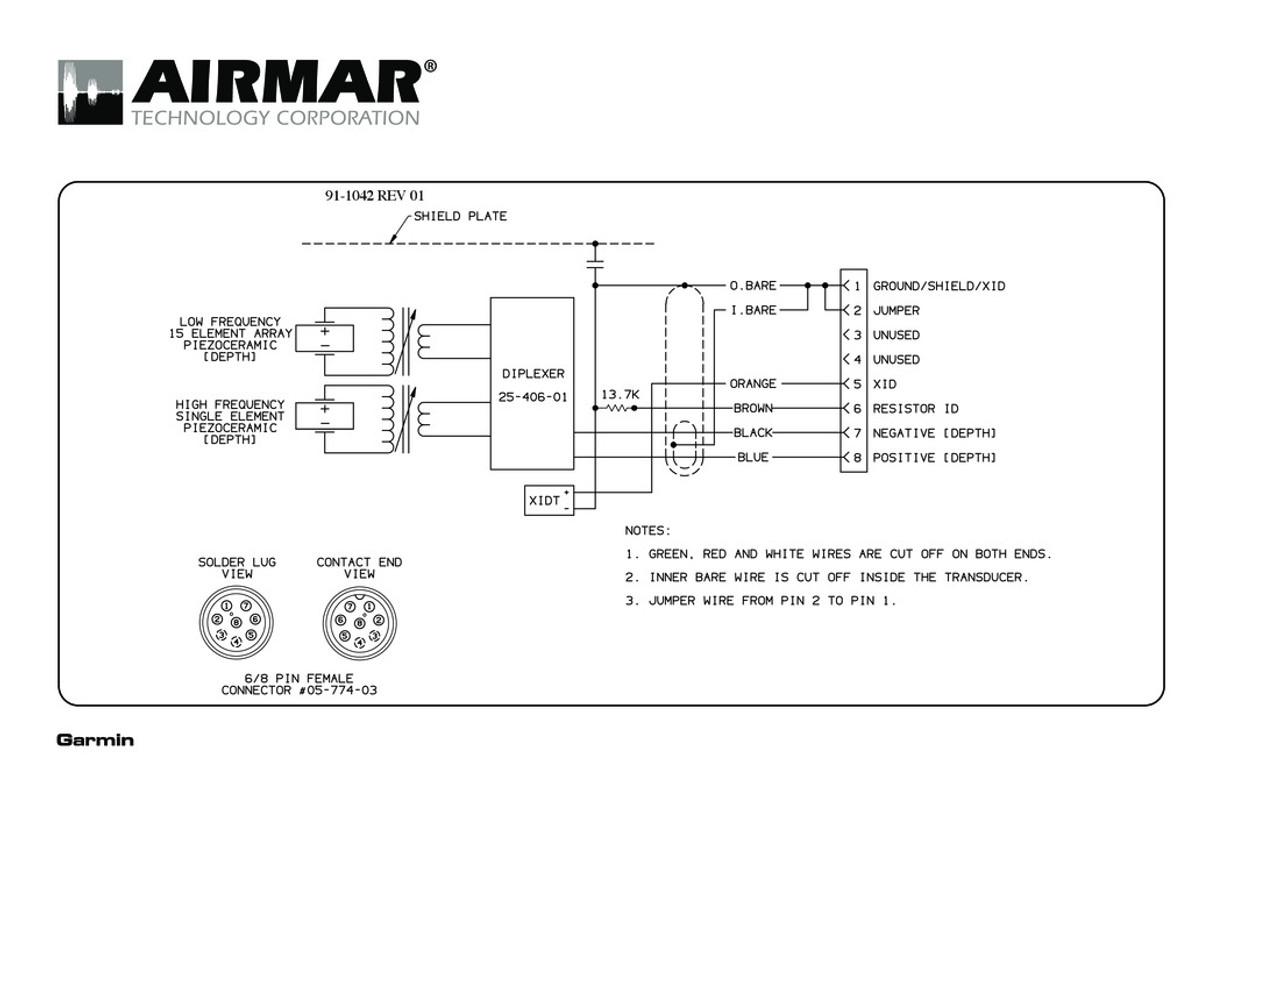 Swell Airmar Wiring Diagram Garmin R199 8 Pin D T Blue Bottle Marine Wiring Cloud Venetbieswglorg